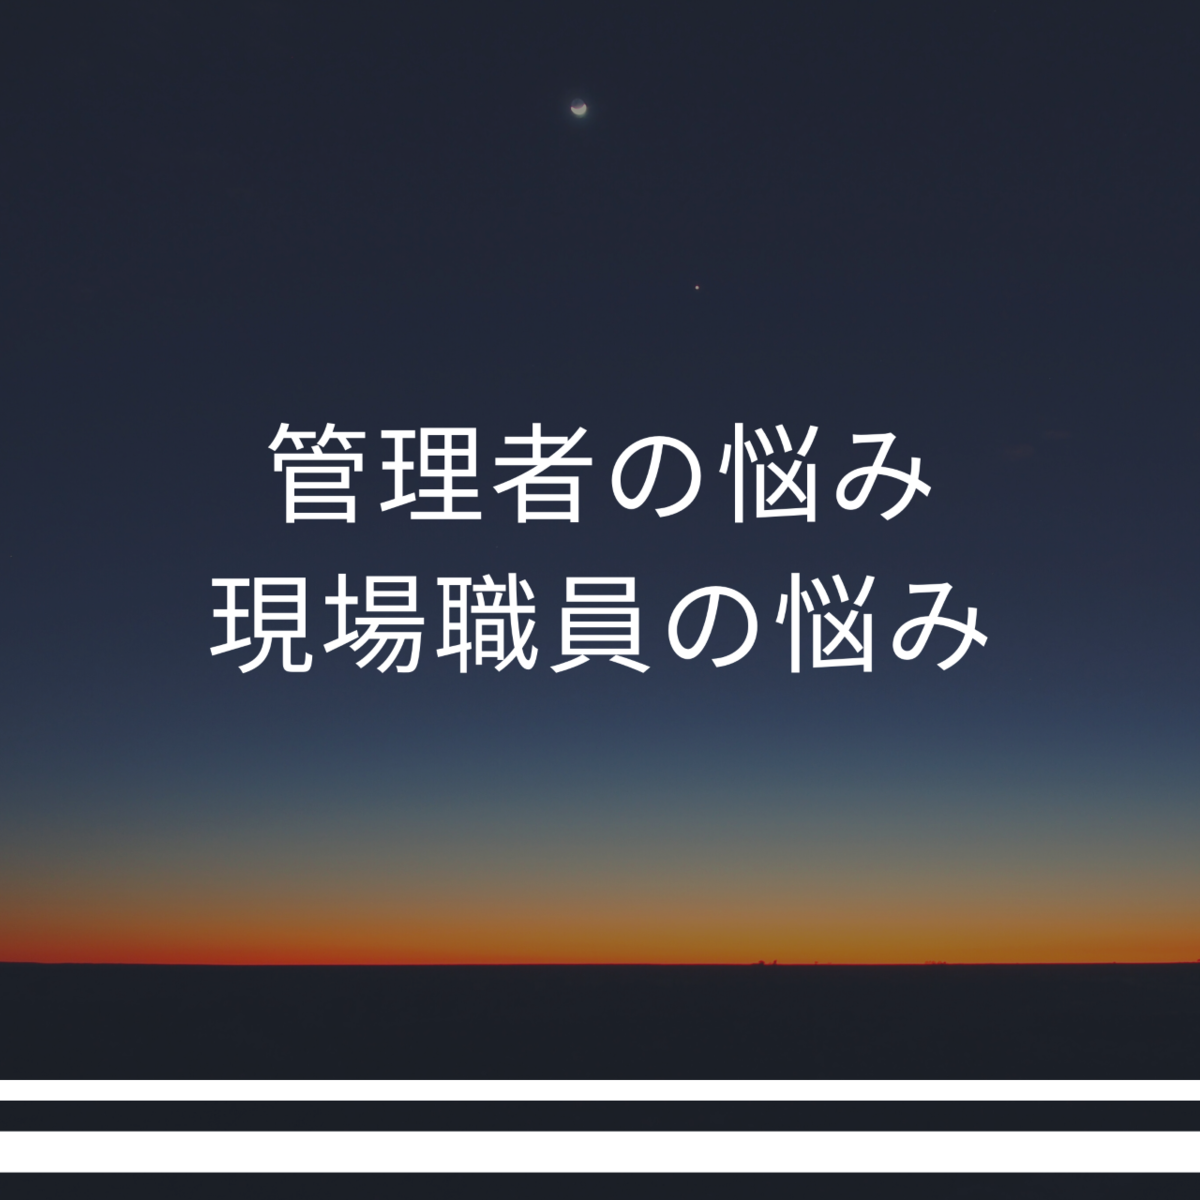 f:id:himawariasano5506:20191127233000p:plain